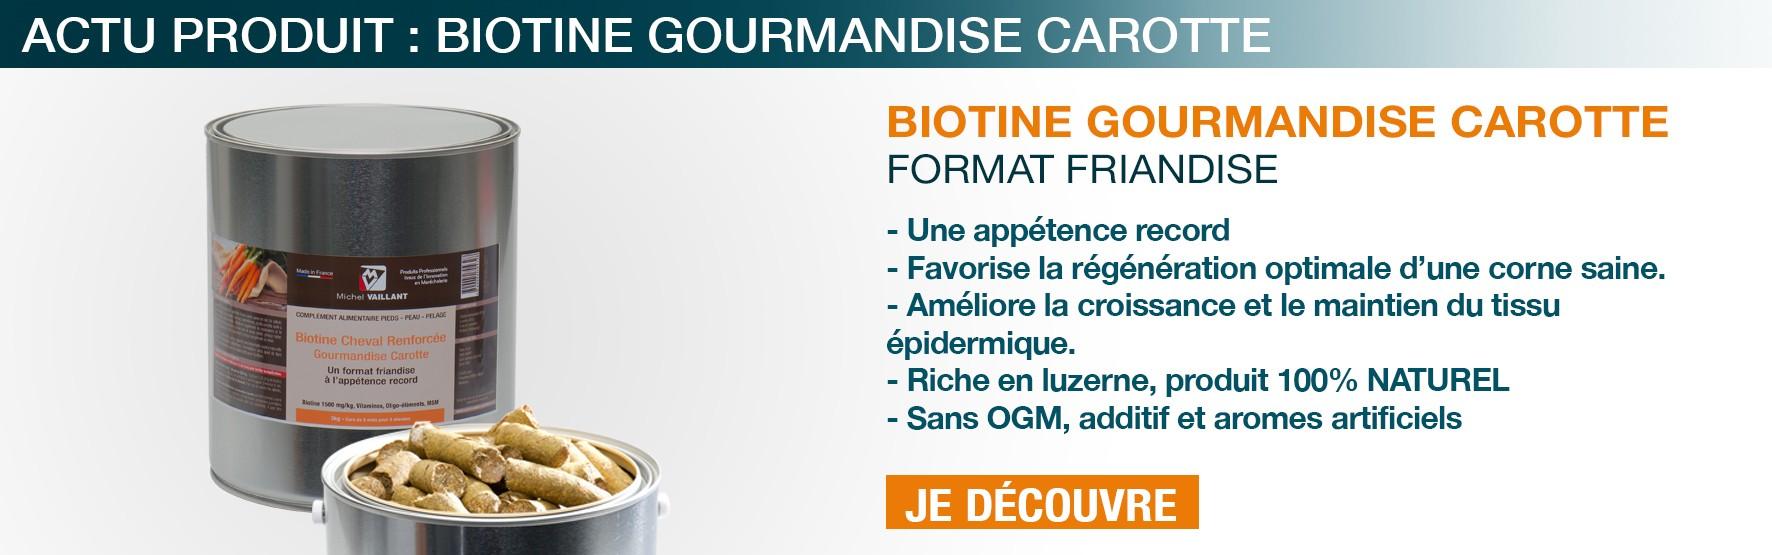 Biotine - soin - carotte - cheval - Friandise - Gourmandise - appétence - sabot